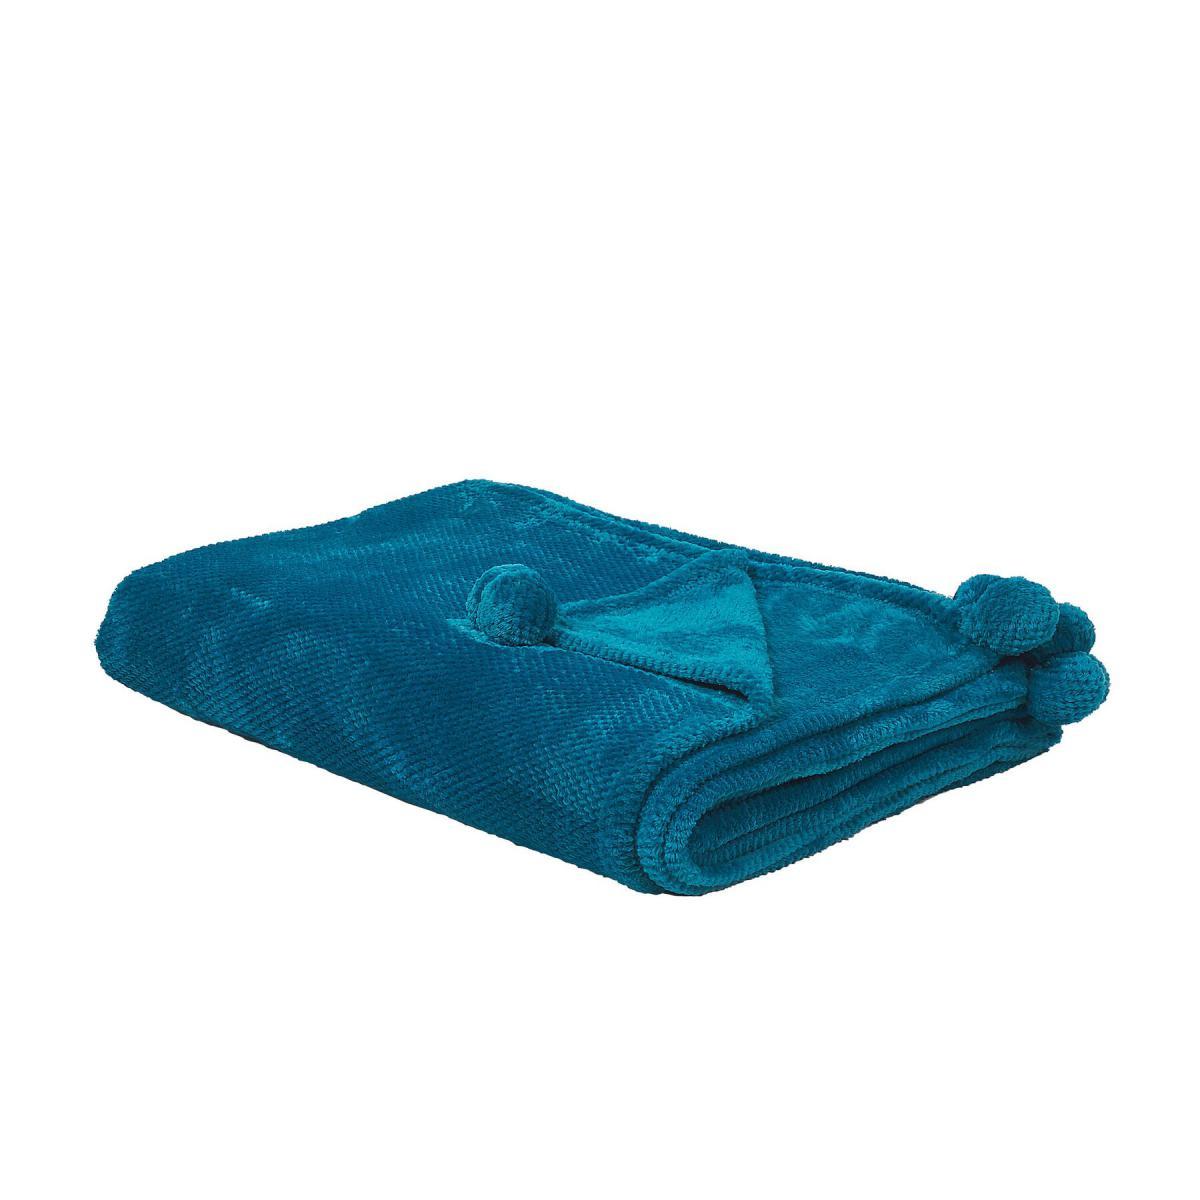 Beliani Beliani Plaid bleu turquoise 200 x 220 cm SAITLER - turquoise